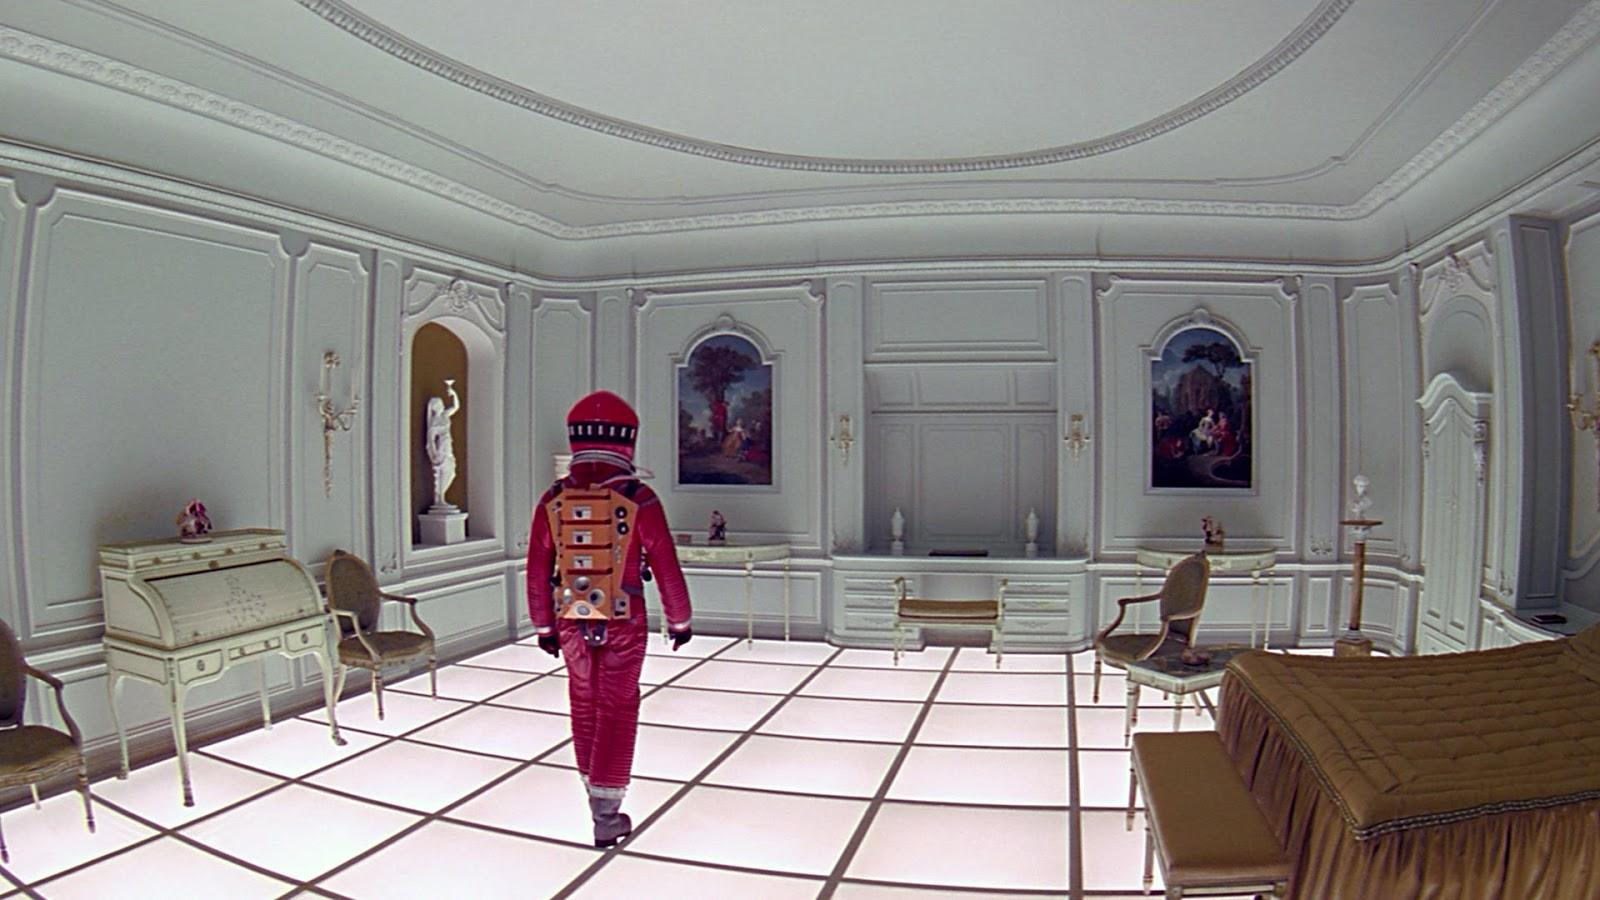 Darya girina interior design march 2015 - A Space Odyssey